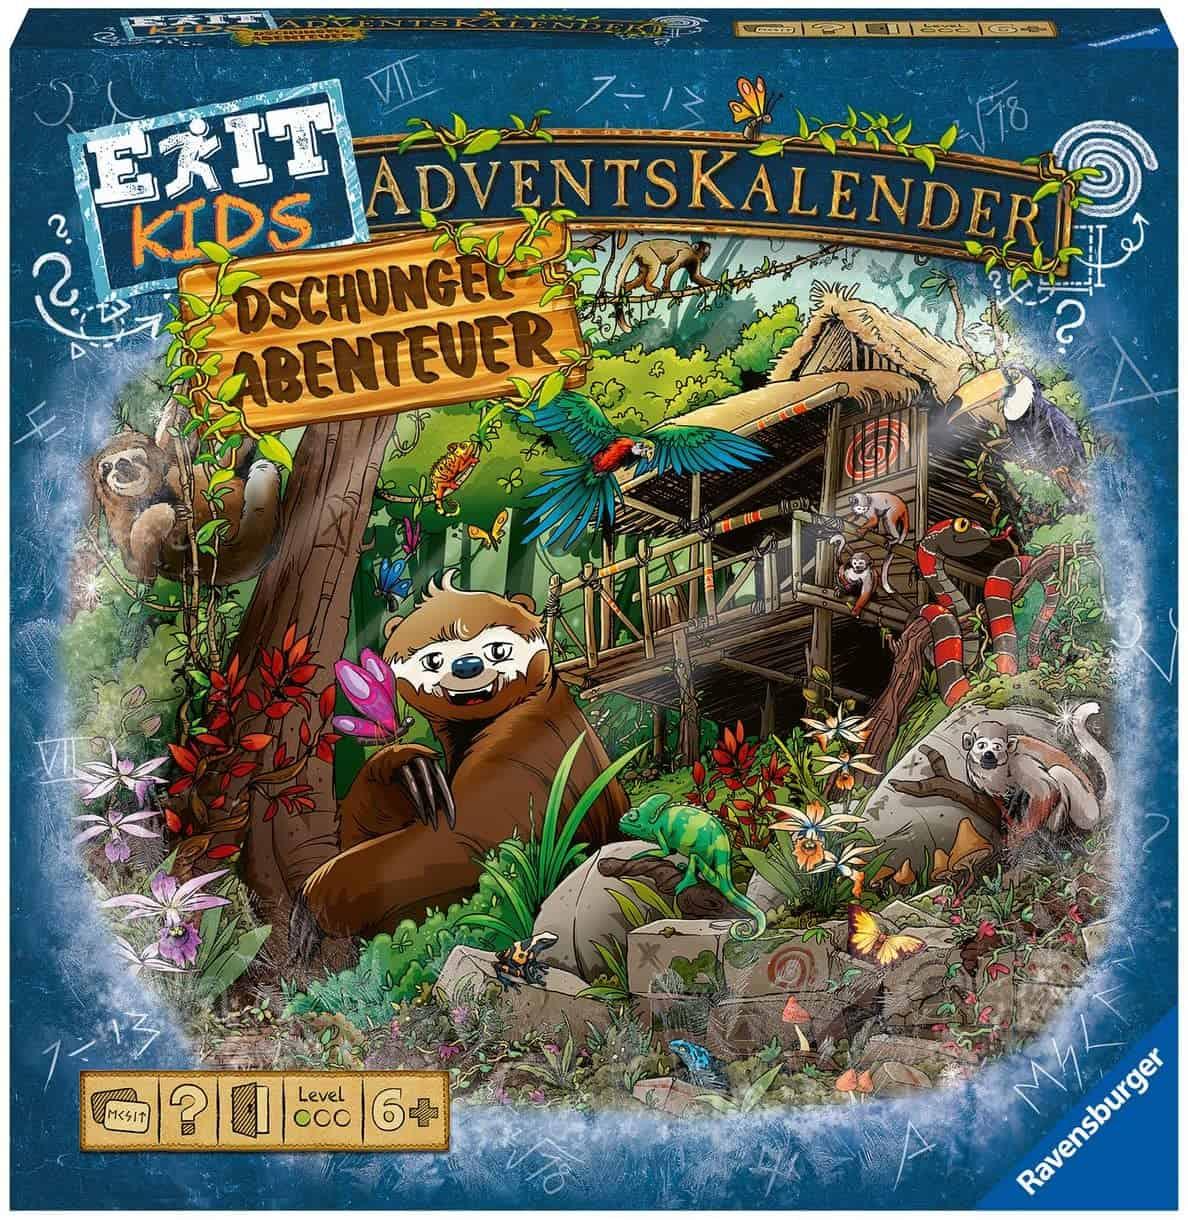 Ravensburger Exit Adventskalender Kids 2021 Dschungel-Abenteuer